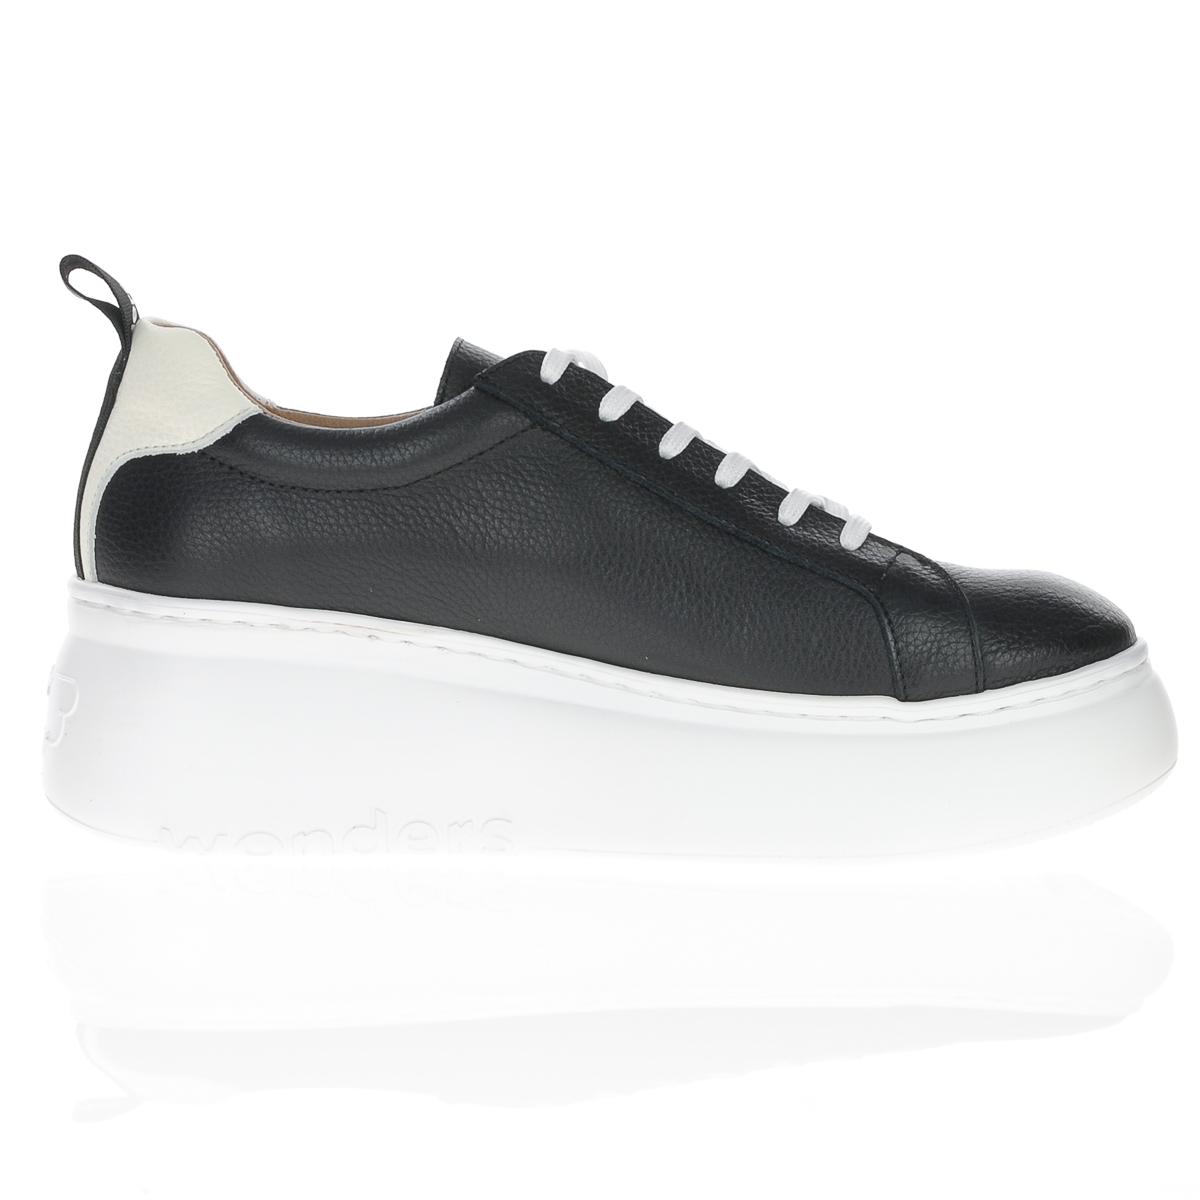 A-2603 Wonders black laced wedge shoe